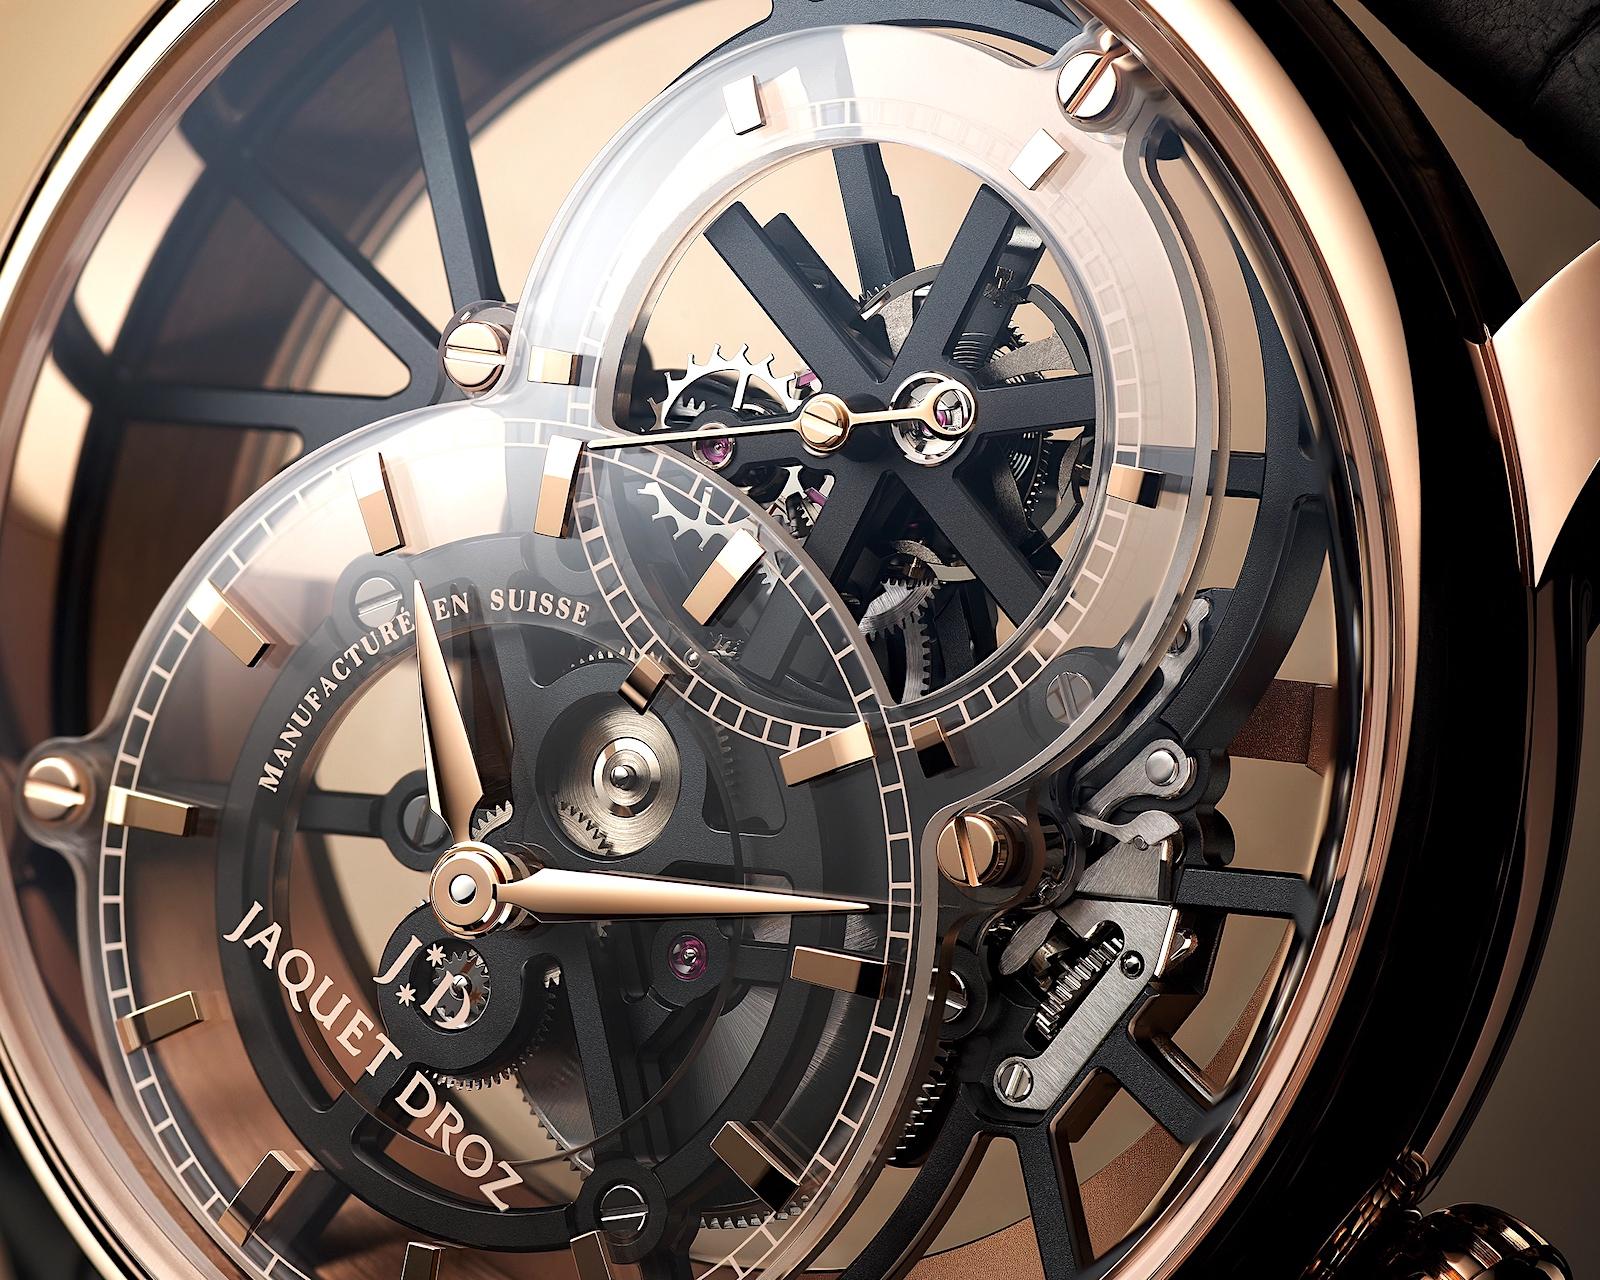 Jaquet Droz Grande Seconde Skelet-One Tourbillon - dial 1